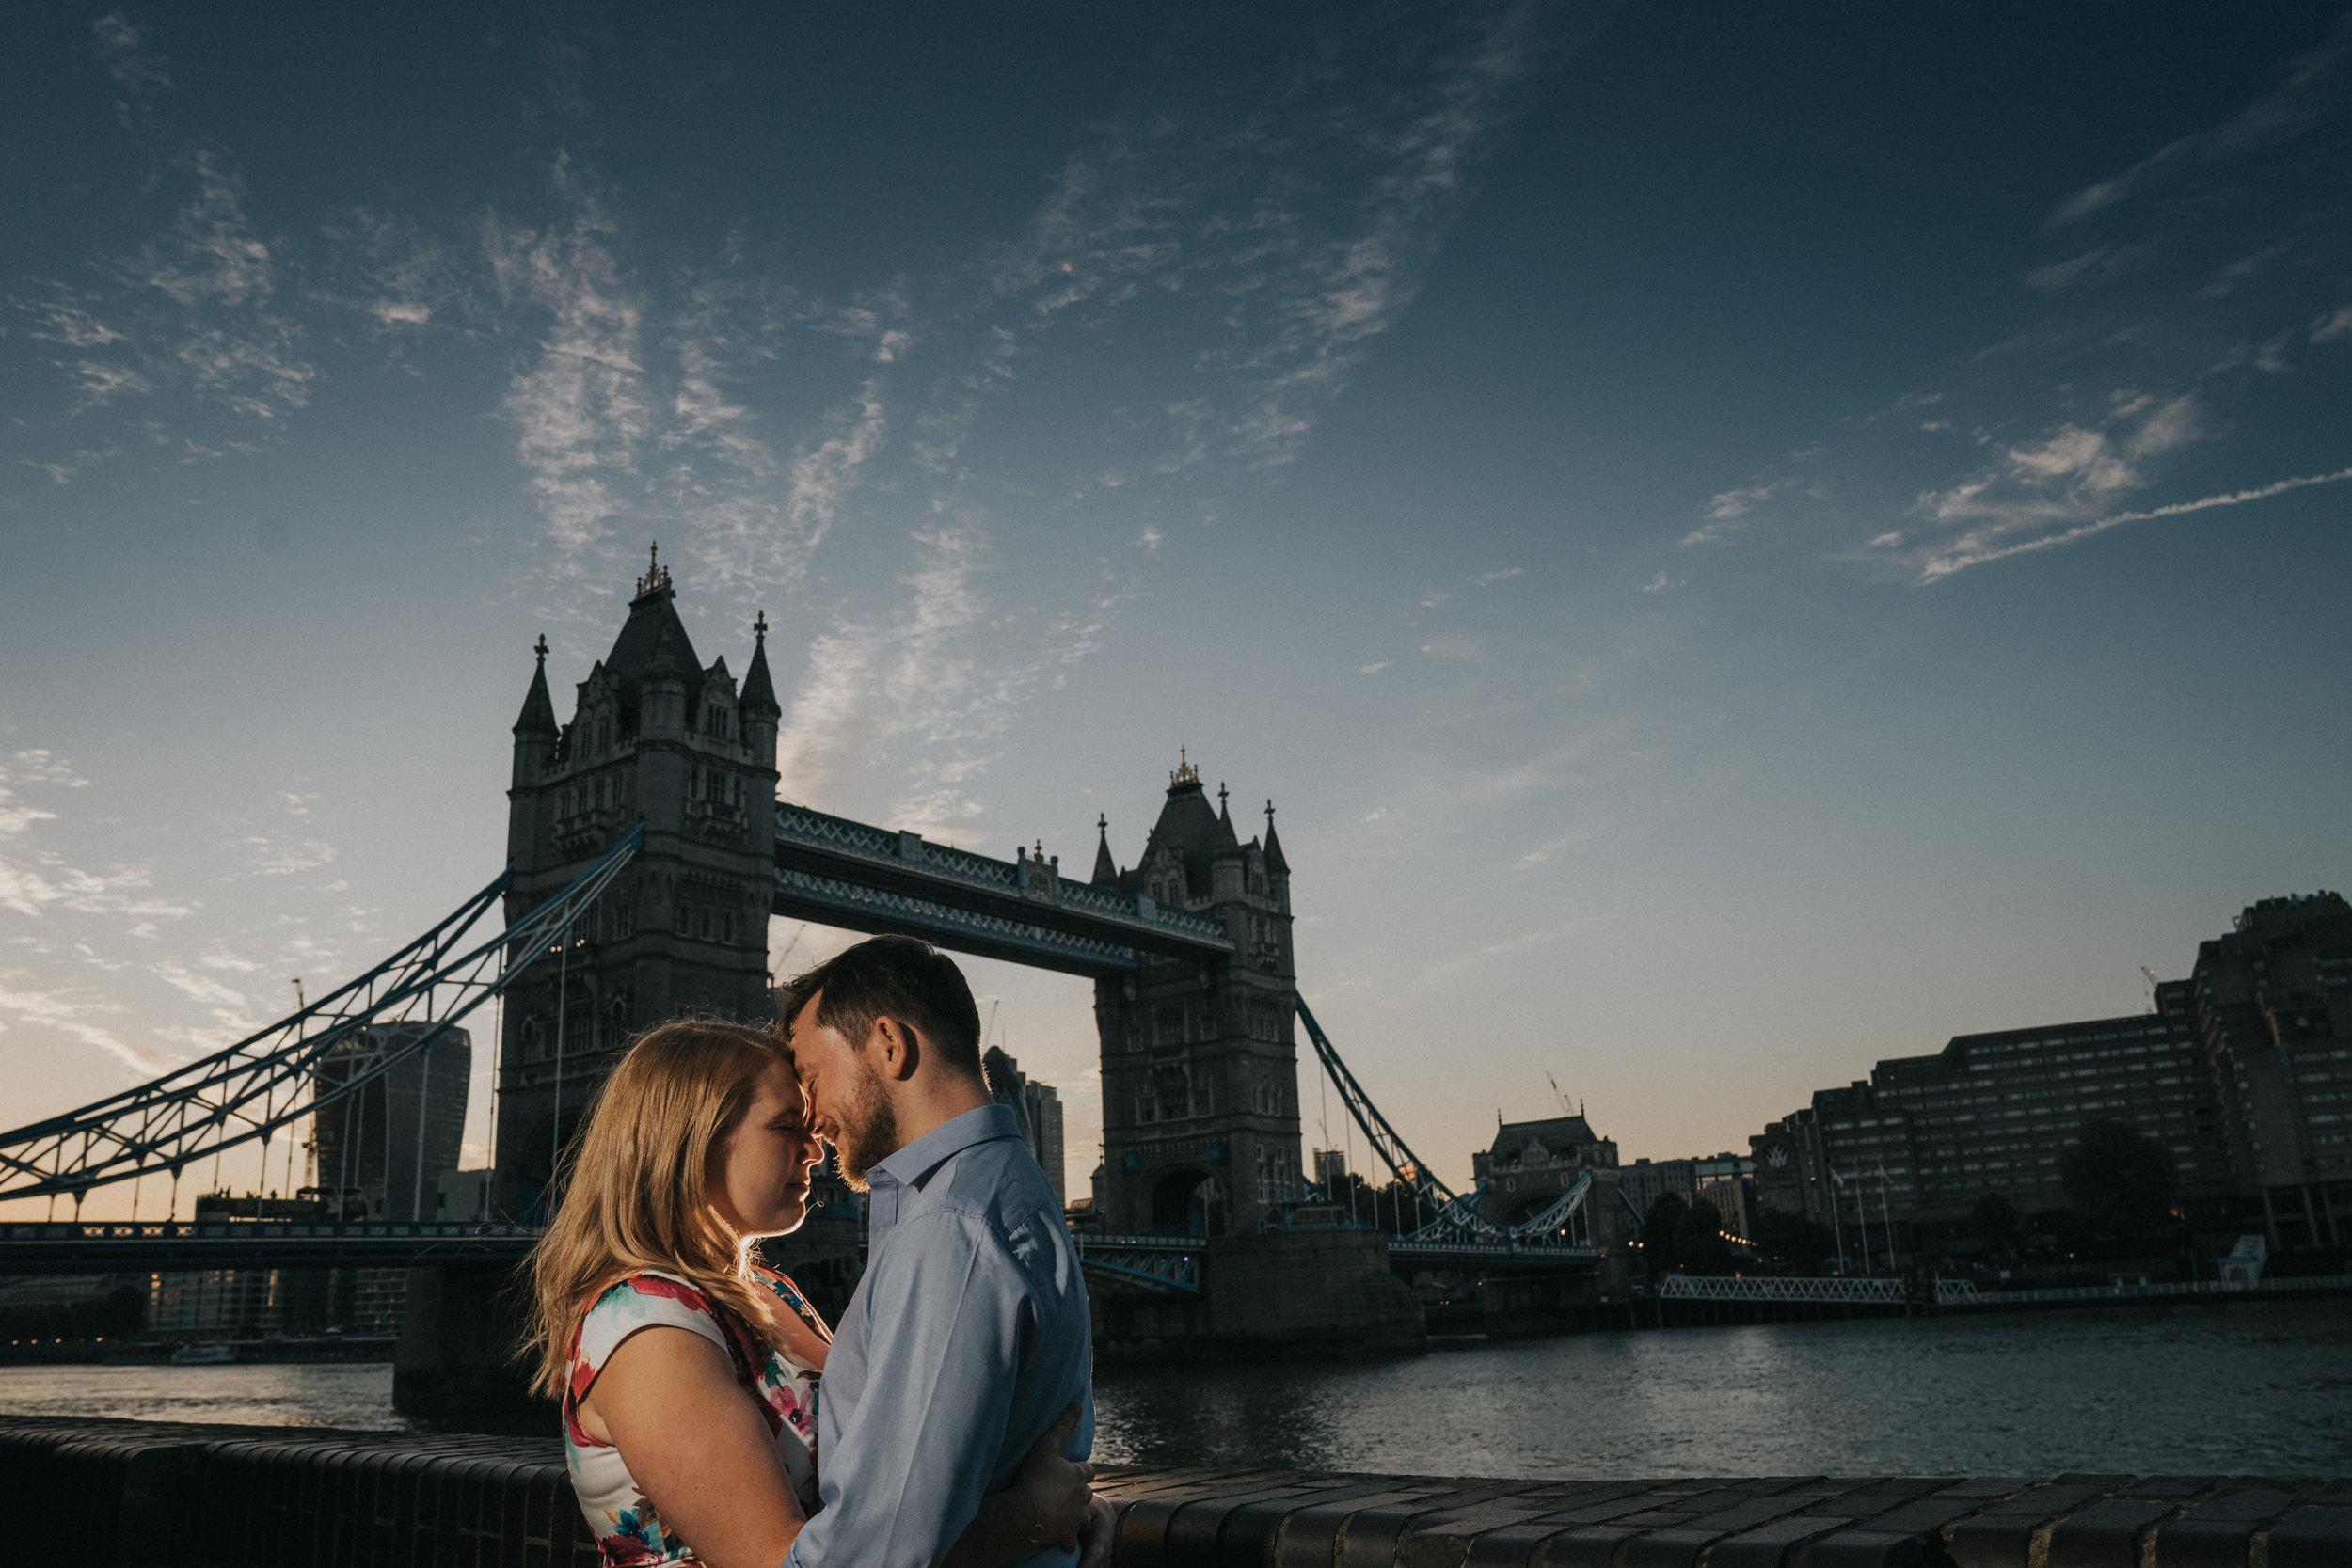 tower-bridge-sunset-engagement-wedding-london-photography-videography-16